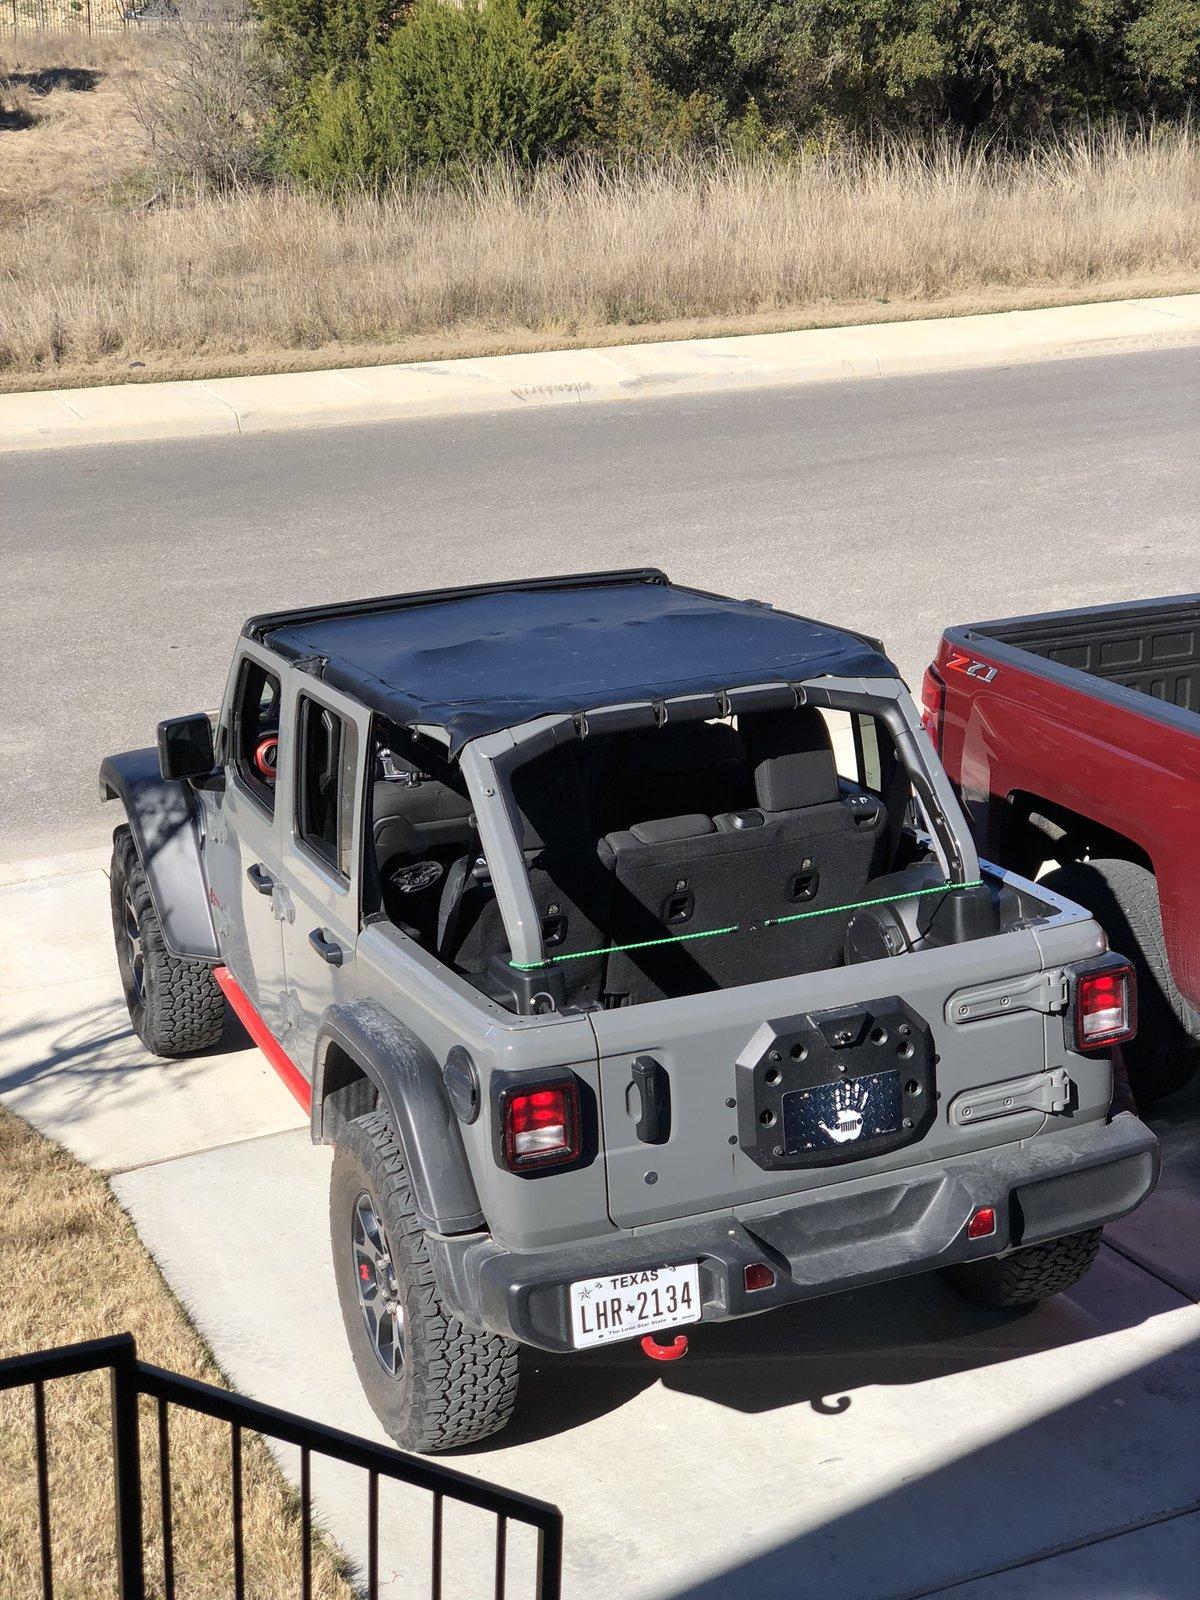 Jeep Summer Tops : summer, Mopar, Bonnet, Waterproof?, 2018+, Wrangler, Forums, Rubicon,, Sahara,, Sport,, Unlimited, JLwranglerforums.com